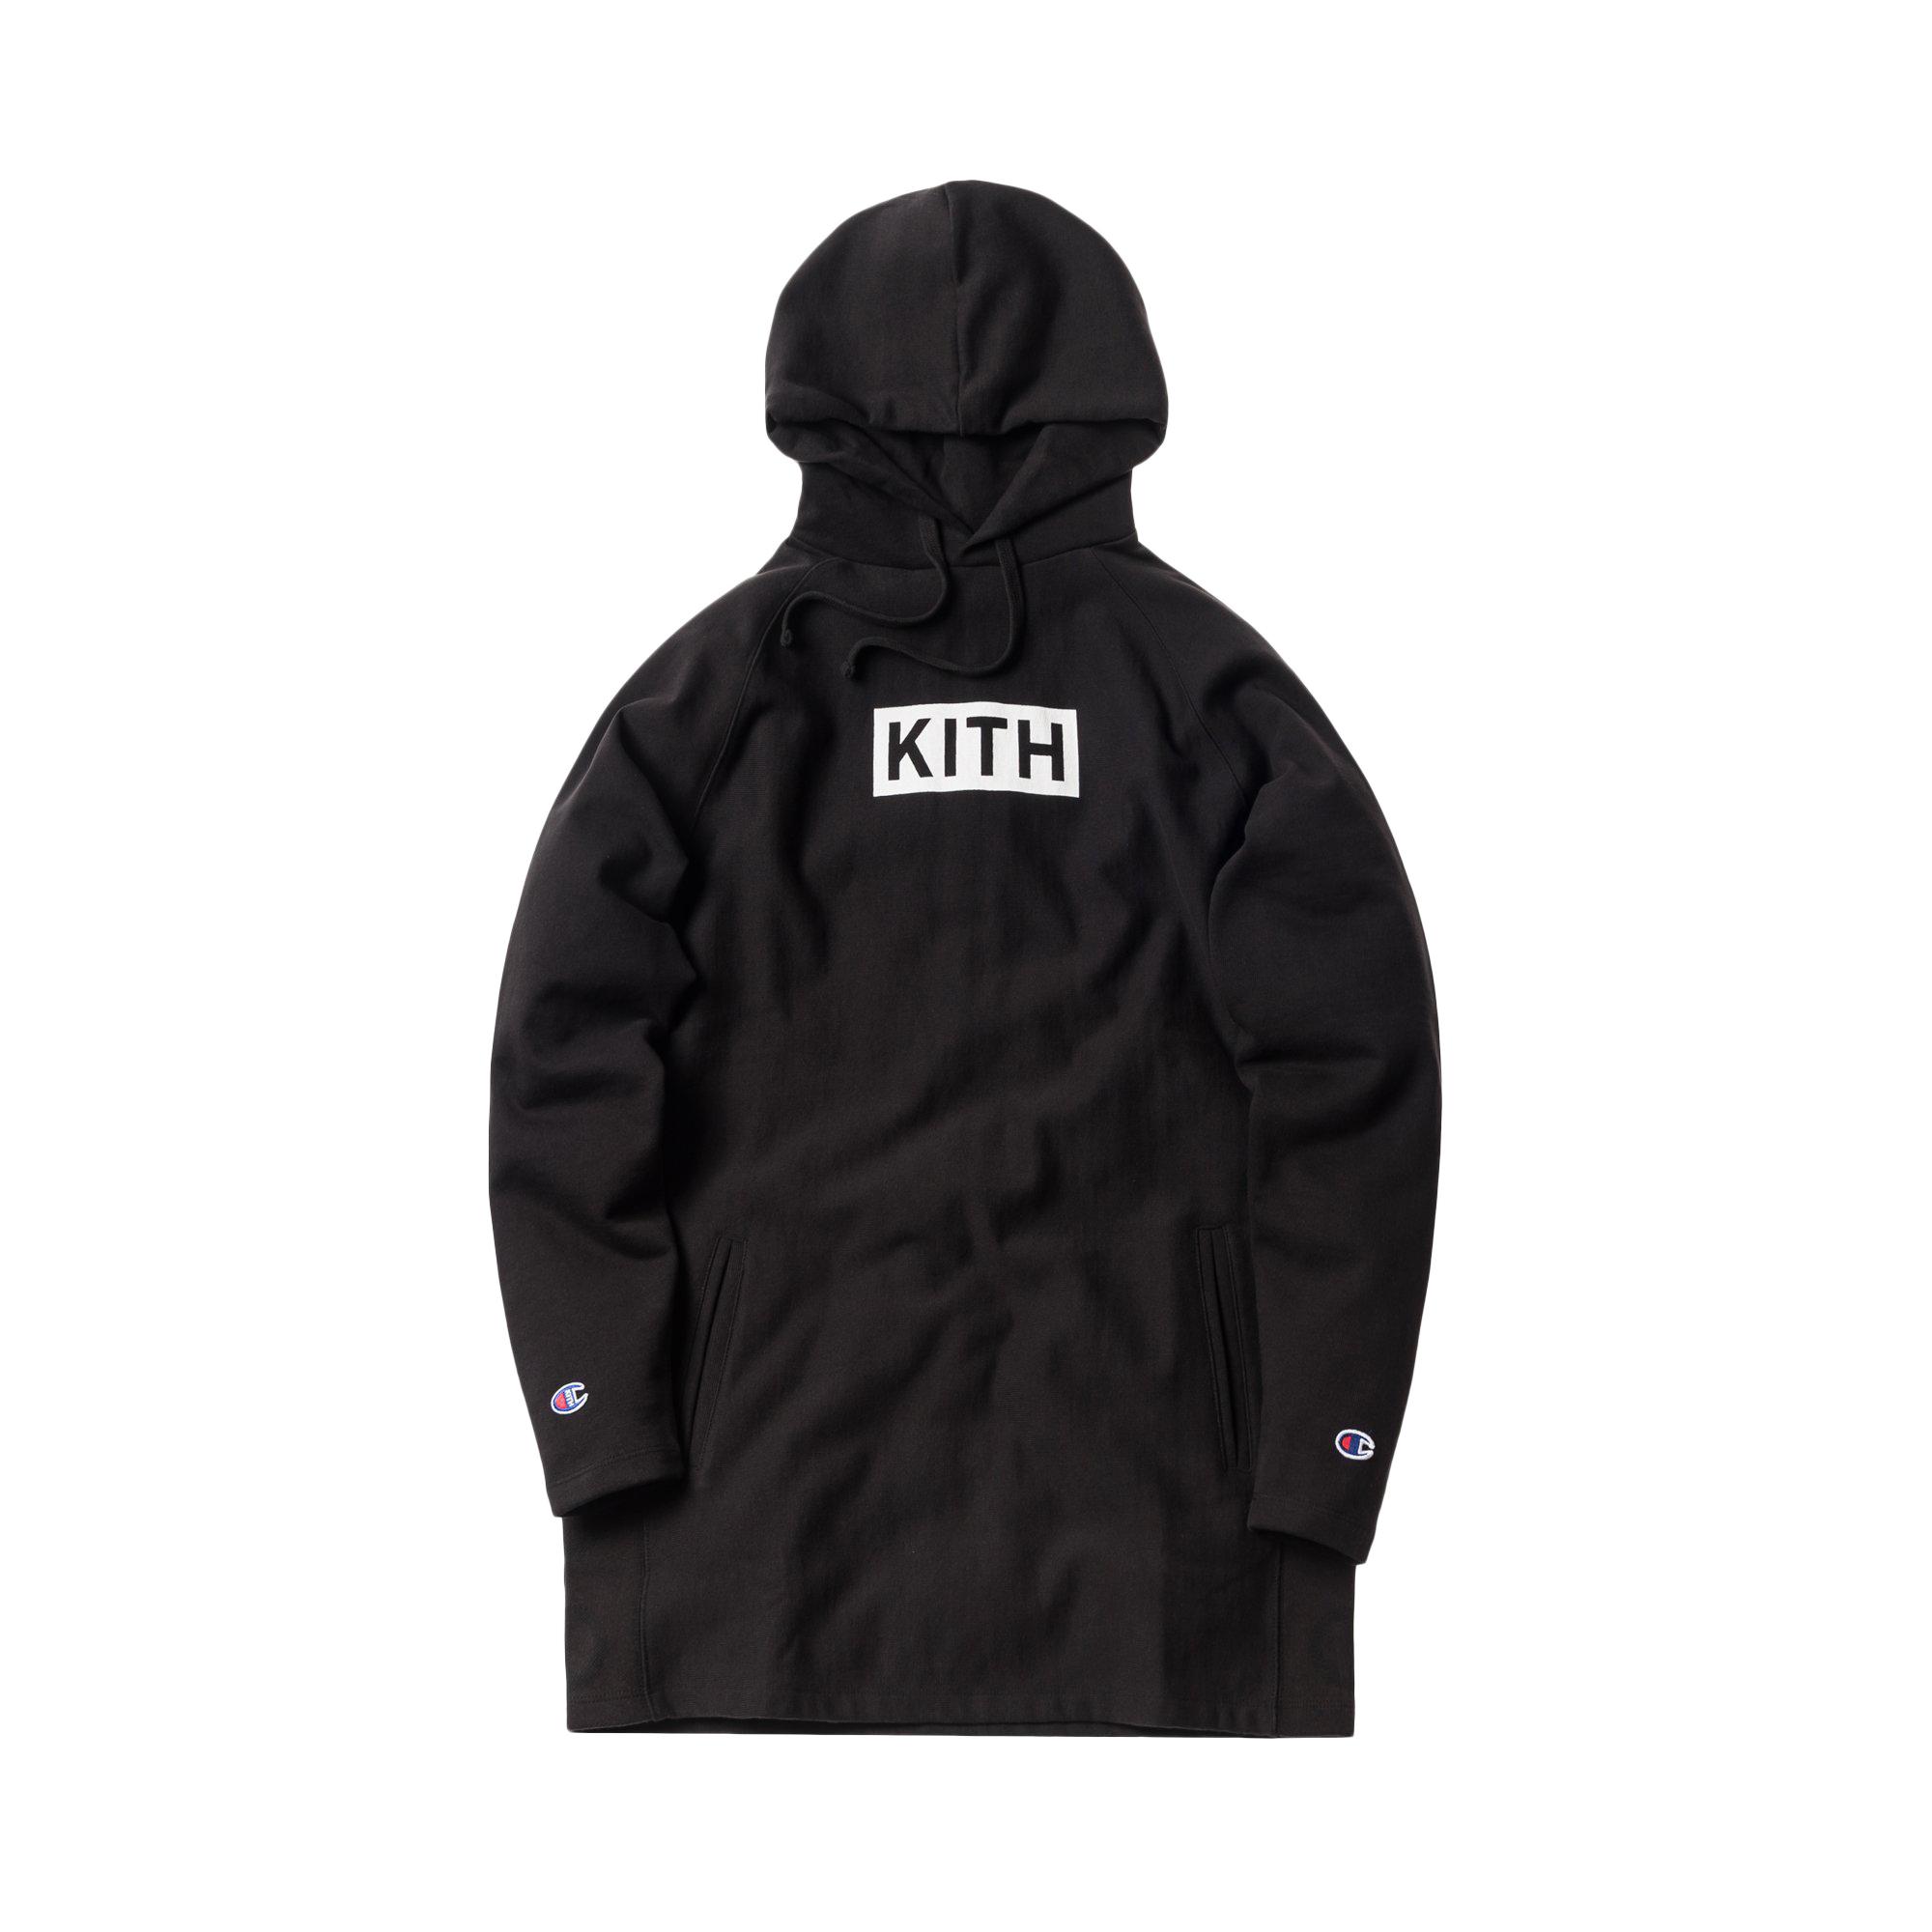 Kith Hoodie Kith Champion Black Kith Extended Extended Hoodie Champion Black EH2YeIbWD9